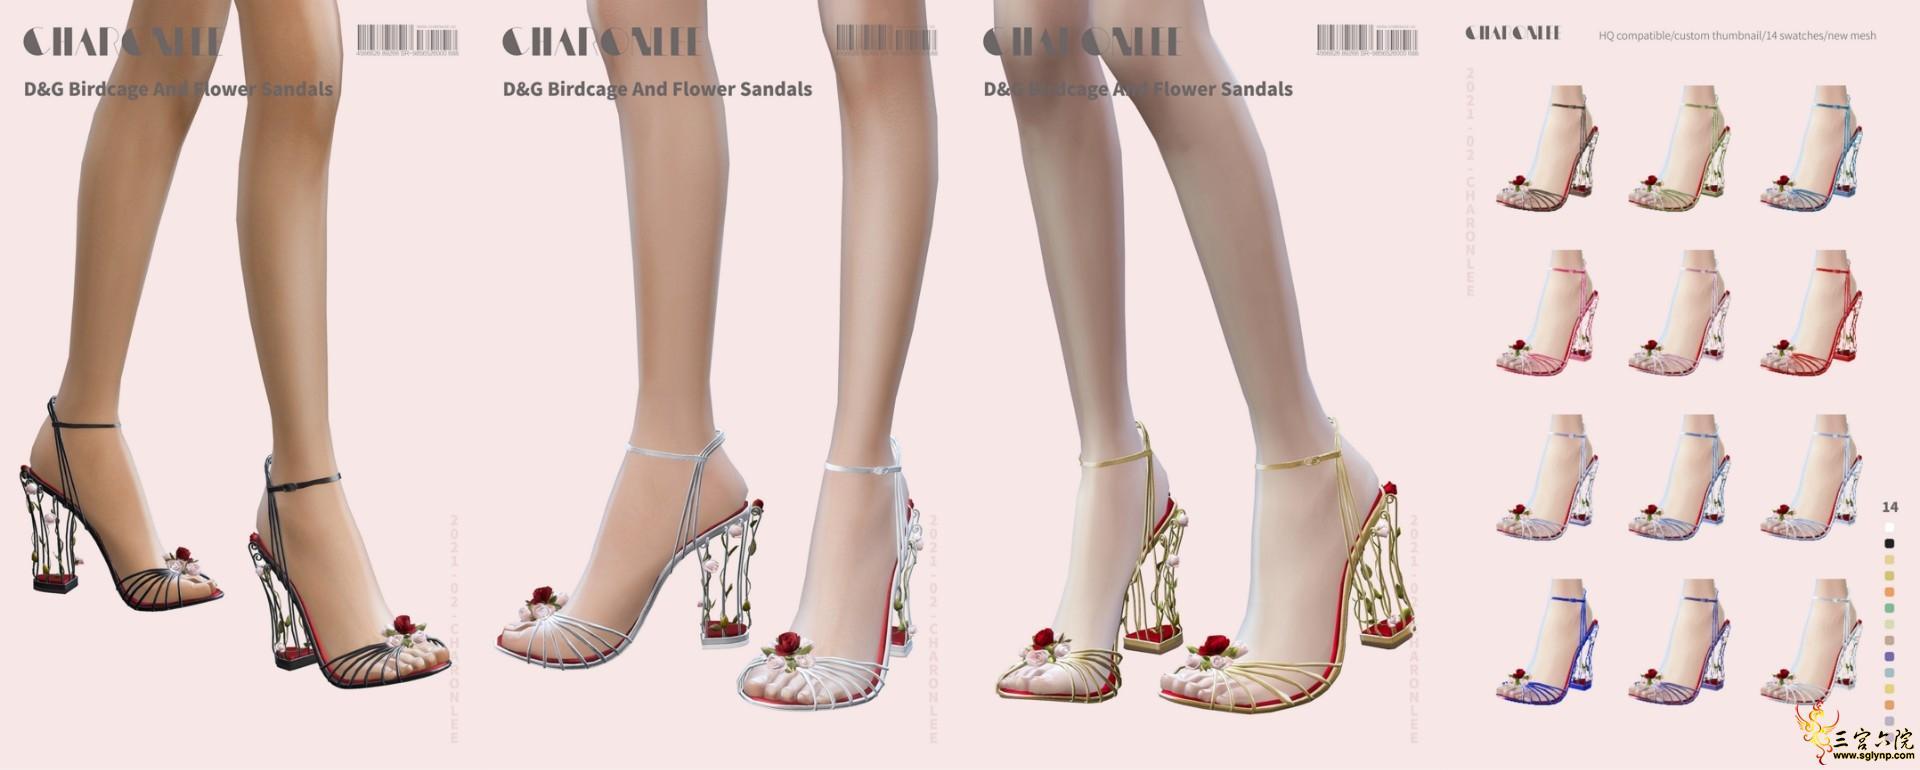 [CHARONLEE]2021-015-D&G Birdcage And Flower Sandals.jpg